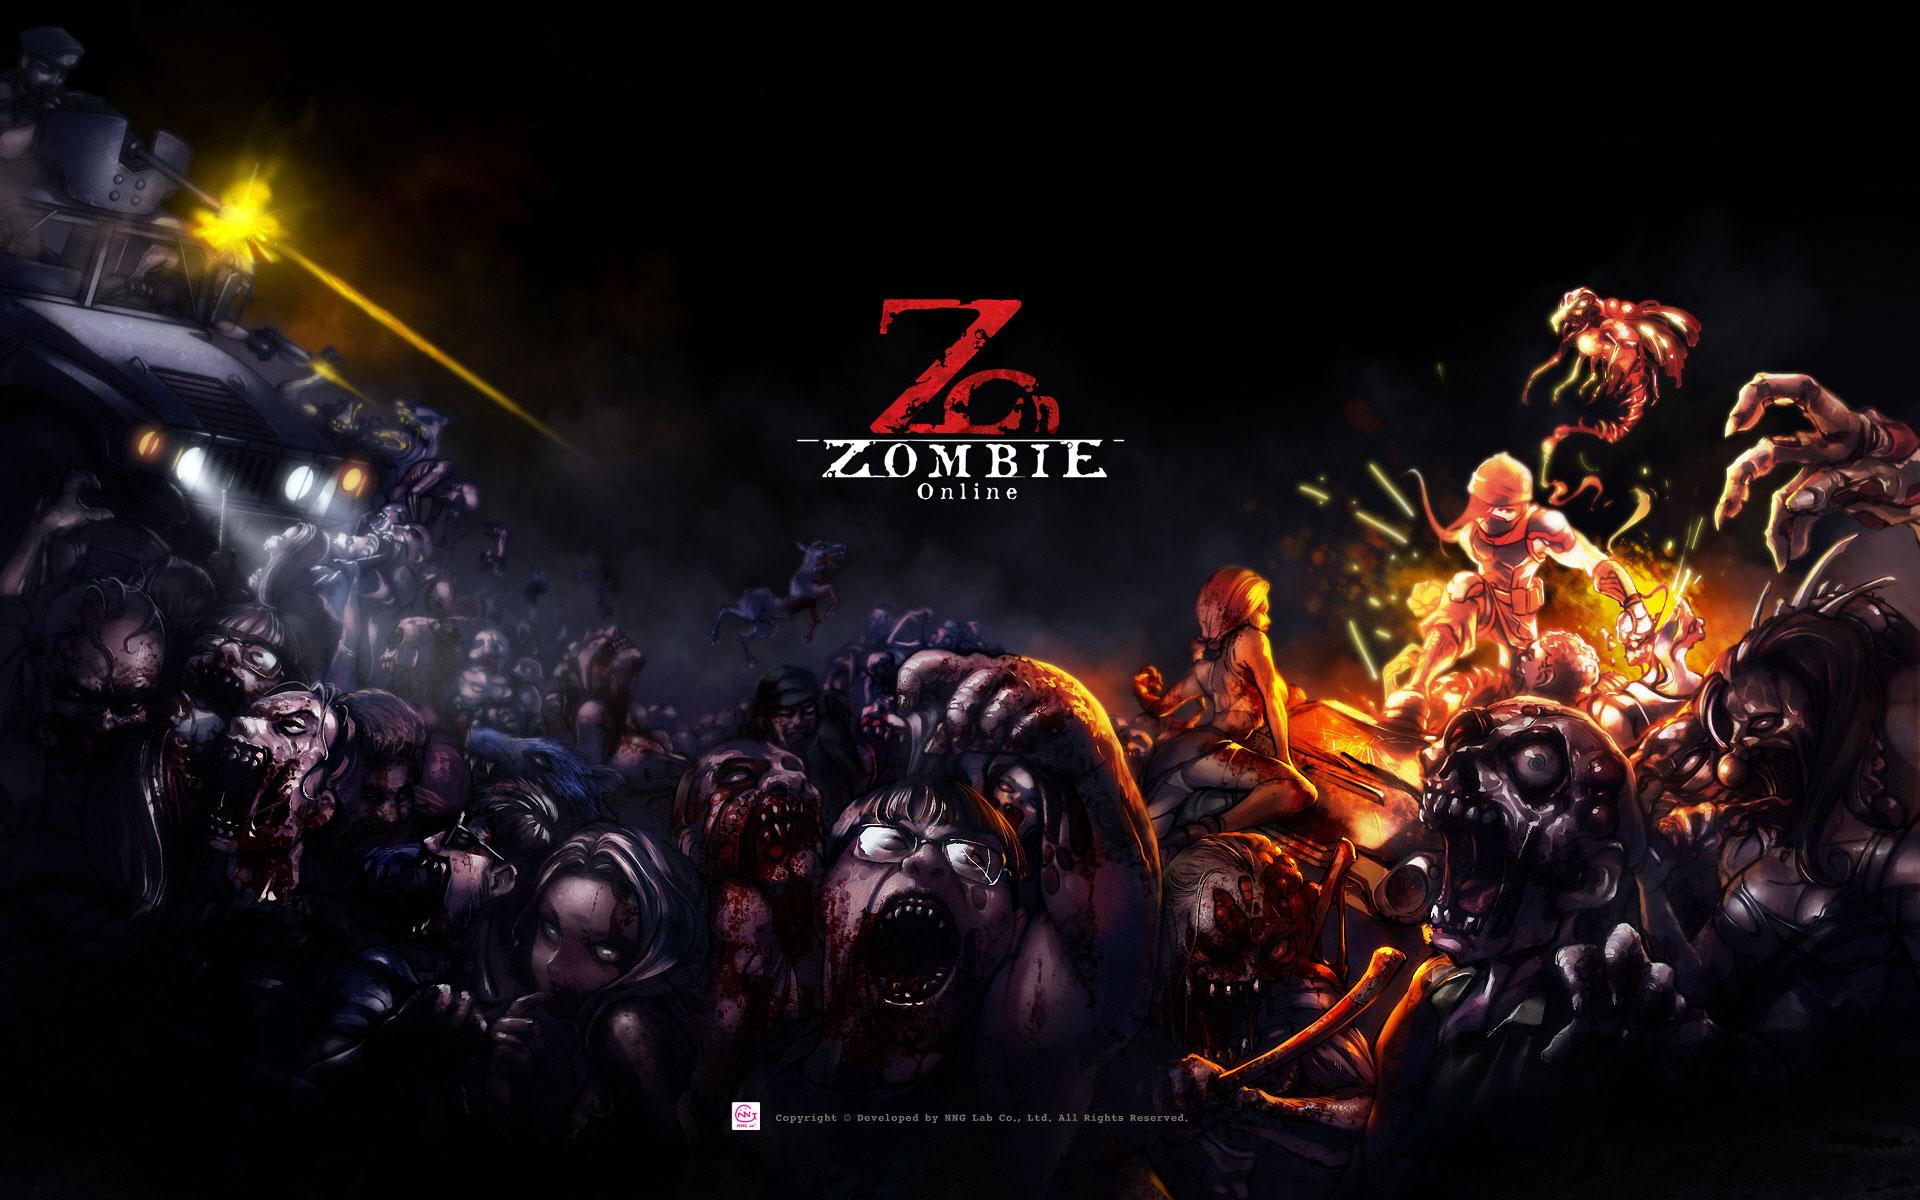 Zombie Online Wallpapers HD Wallpapers 1920x1200